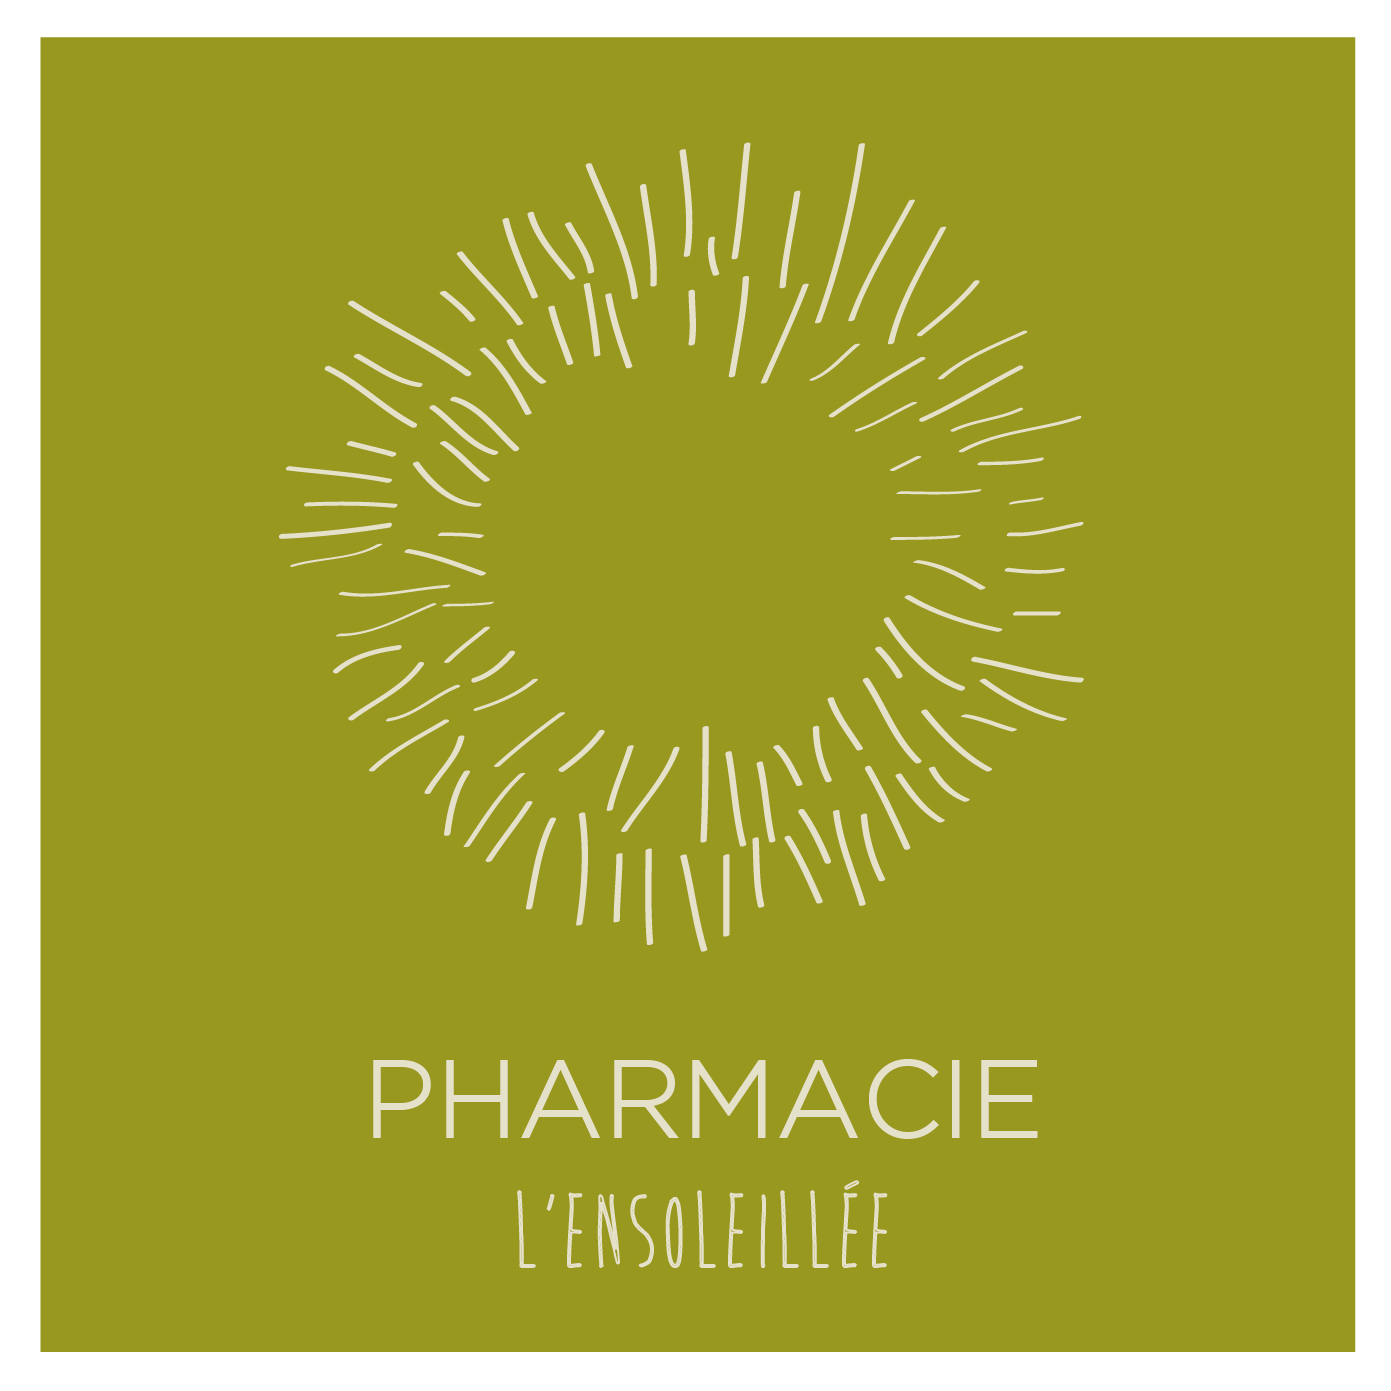 PHARMACIE L'ENSOLEILLEE –  AIX EN PROVENCE (13) 32